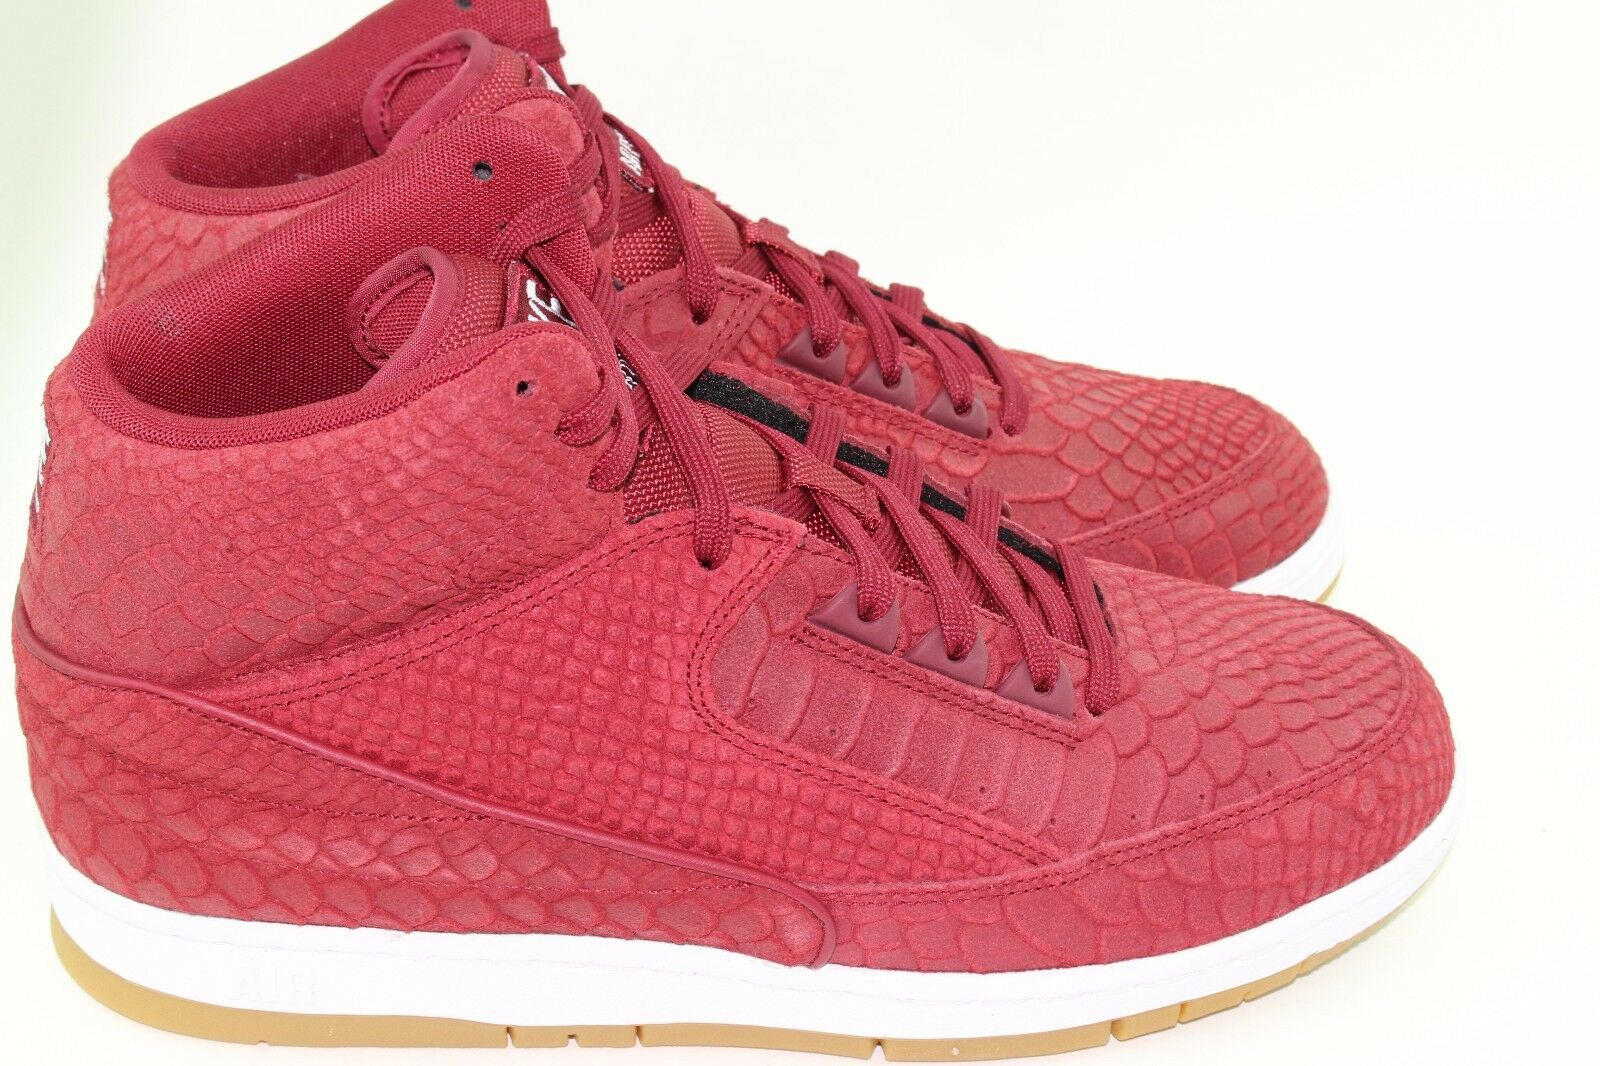 Nike air huarache deriva Uomo ah7334-500 white feroce viola le scarpe verdi 8